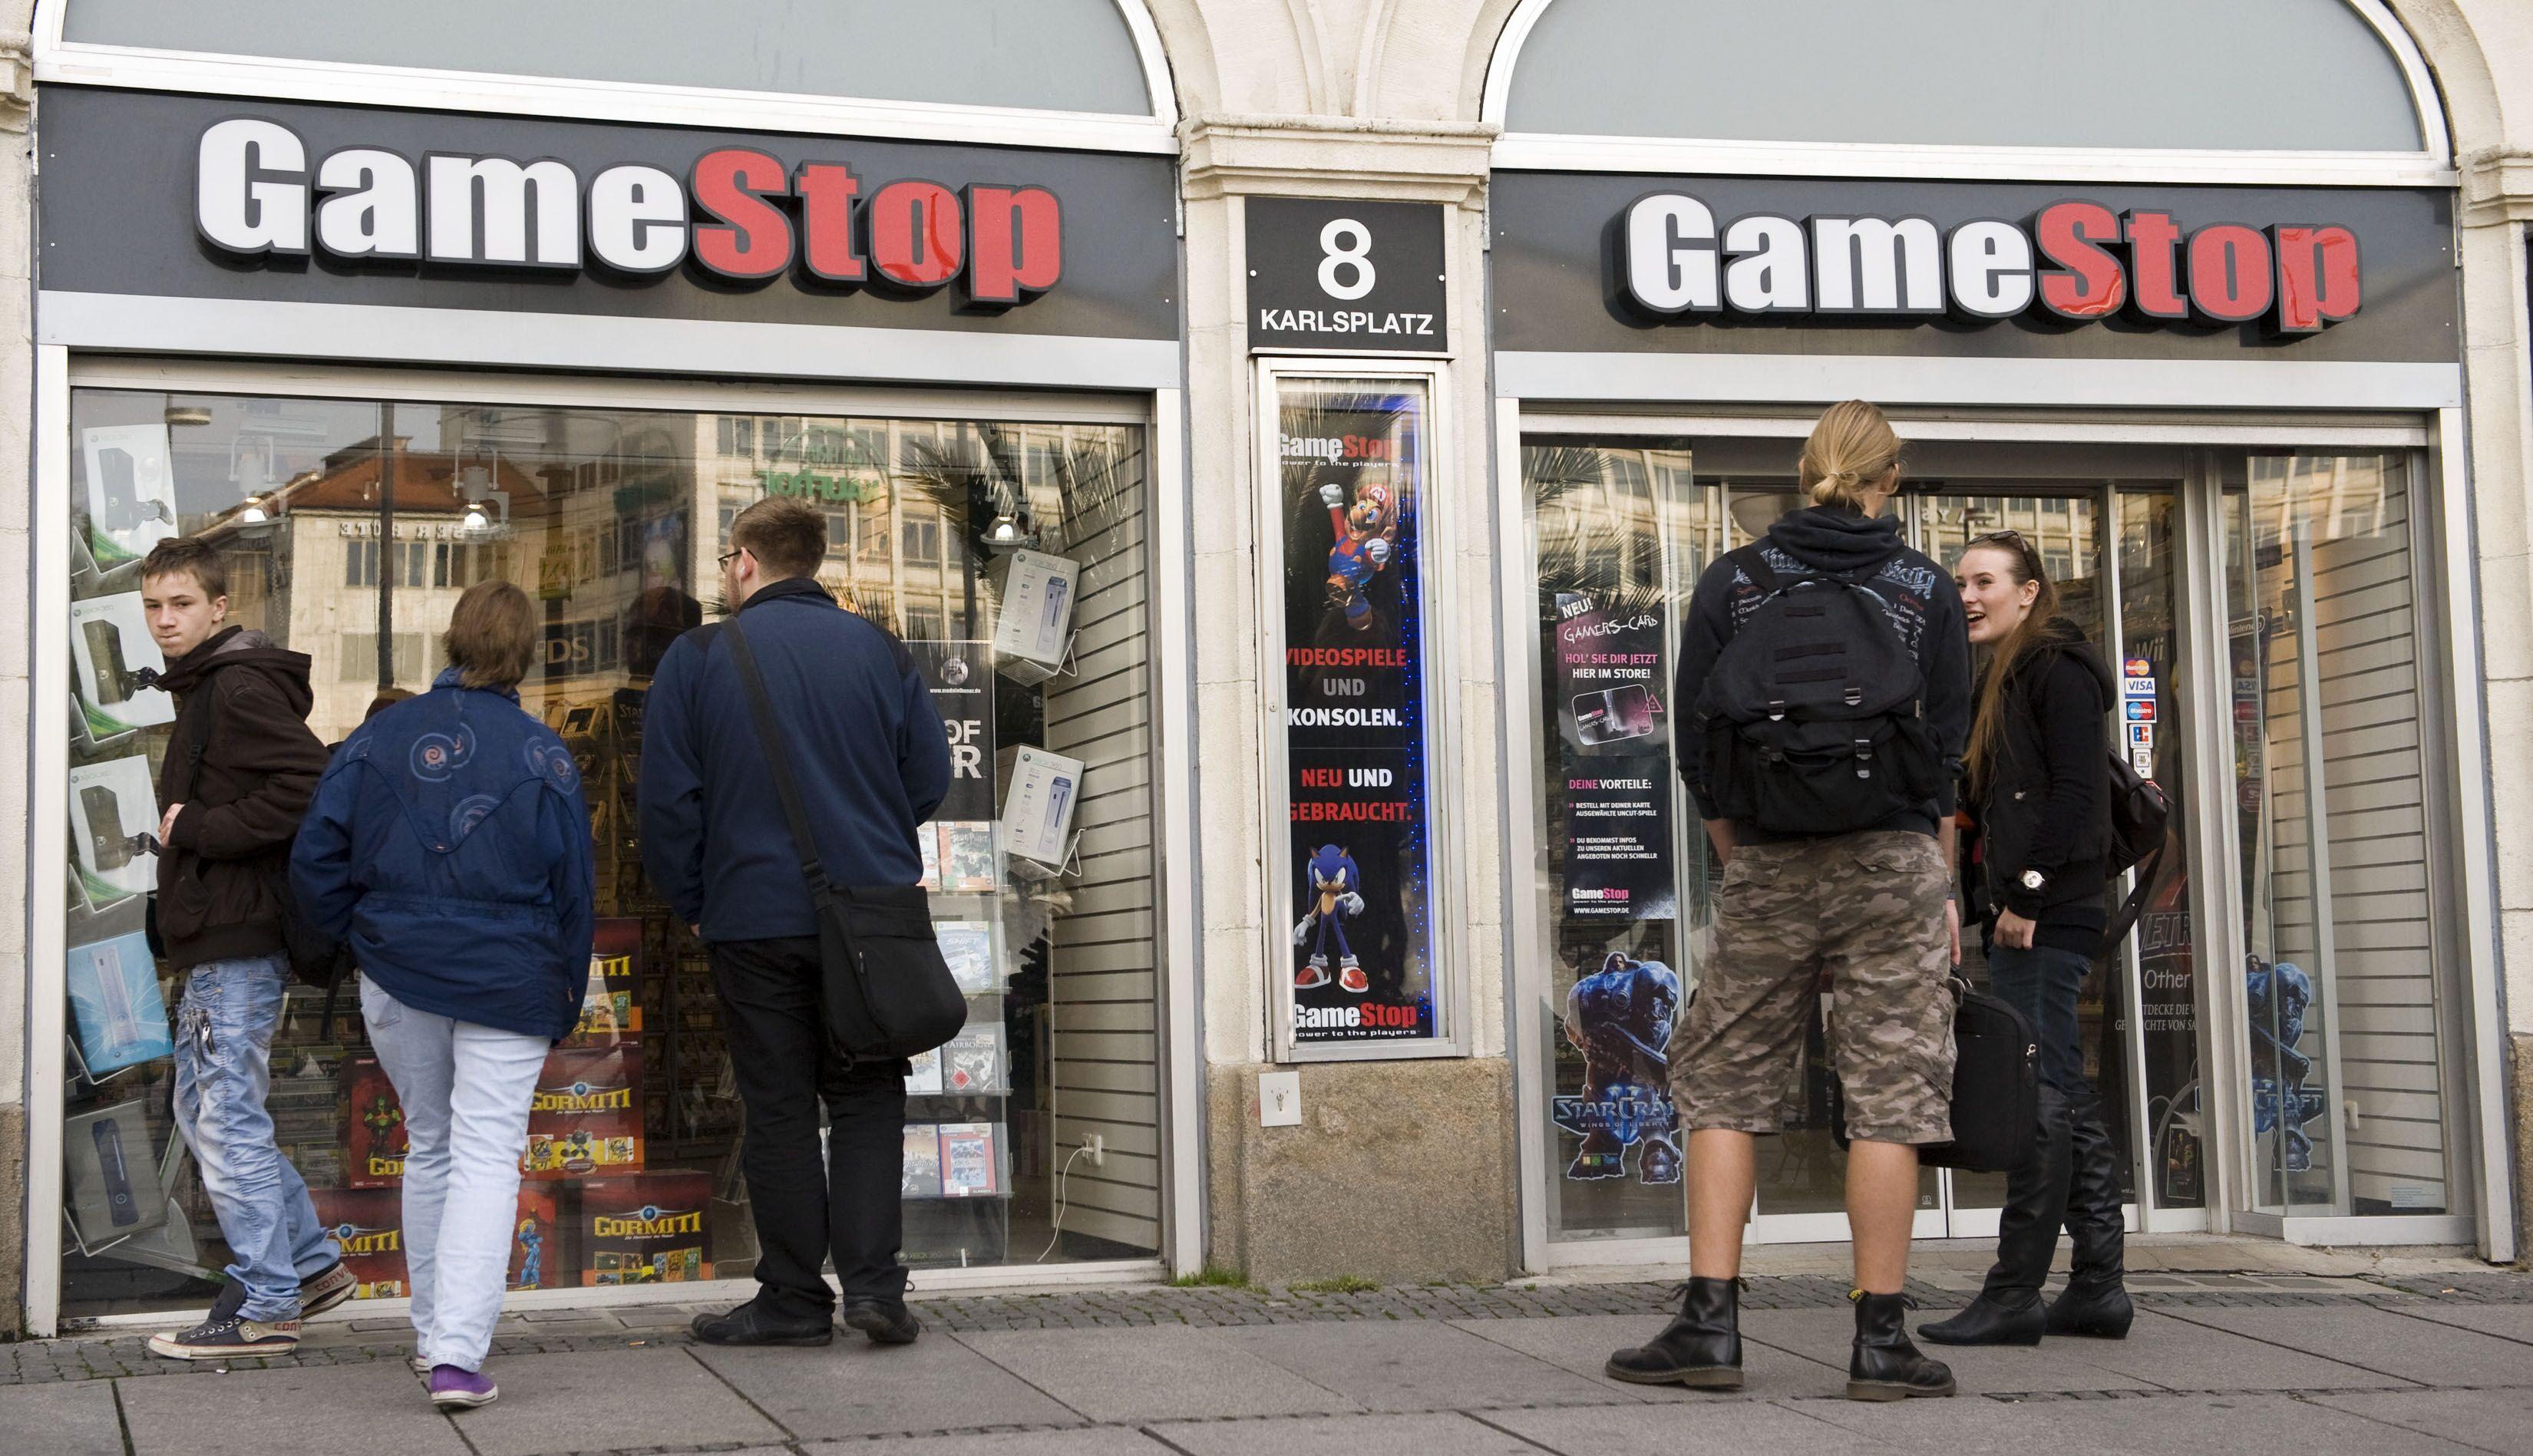 Is Gamestop Open On Christmas Eve